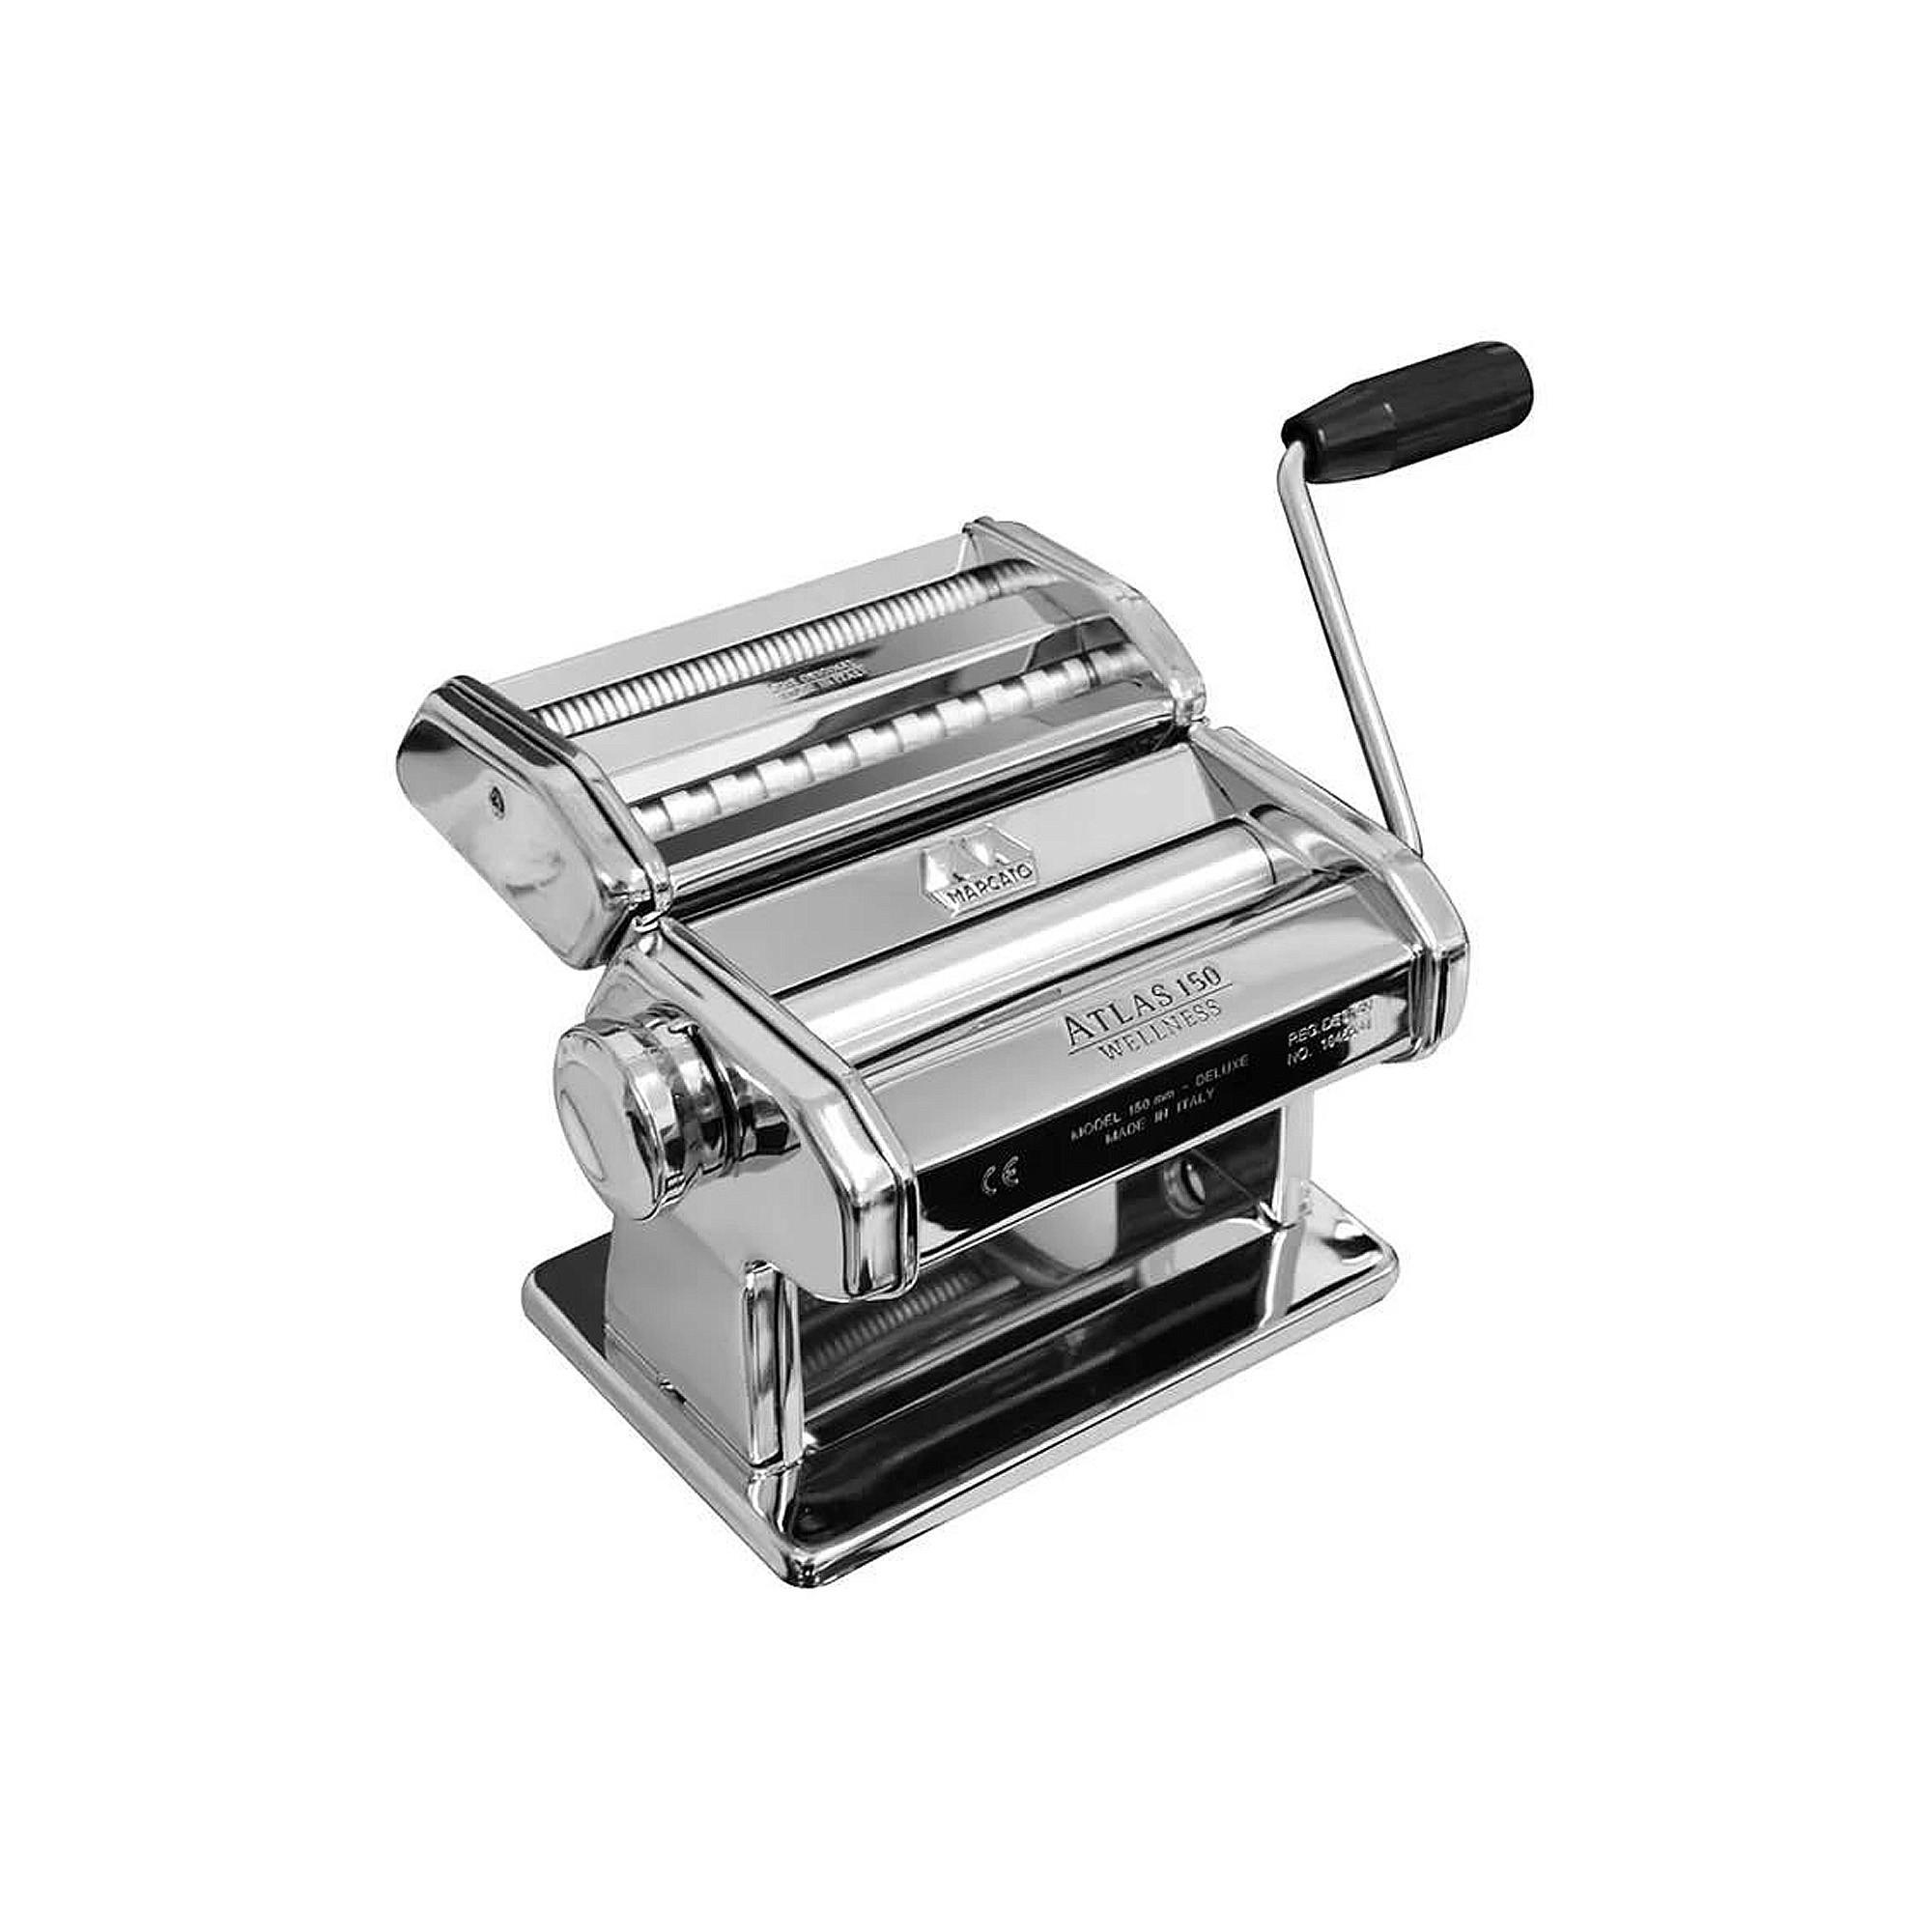 Máquina Para Massas Frescas Caseira Atlas 150 - Marcato  - Sua Casa Gourmet e Cia